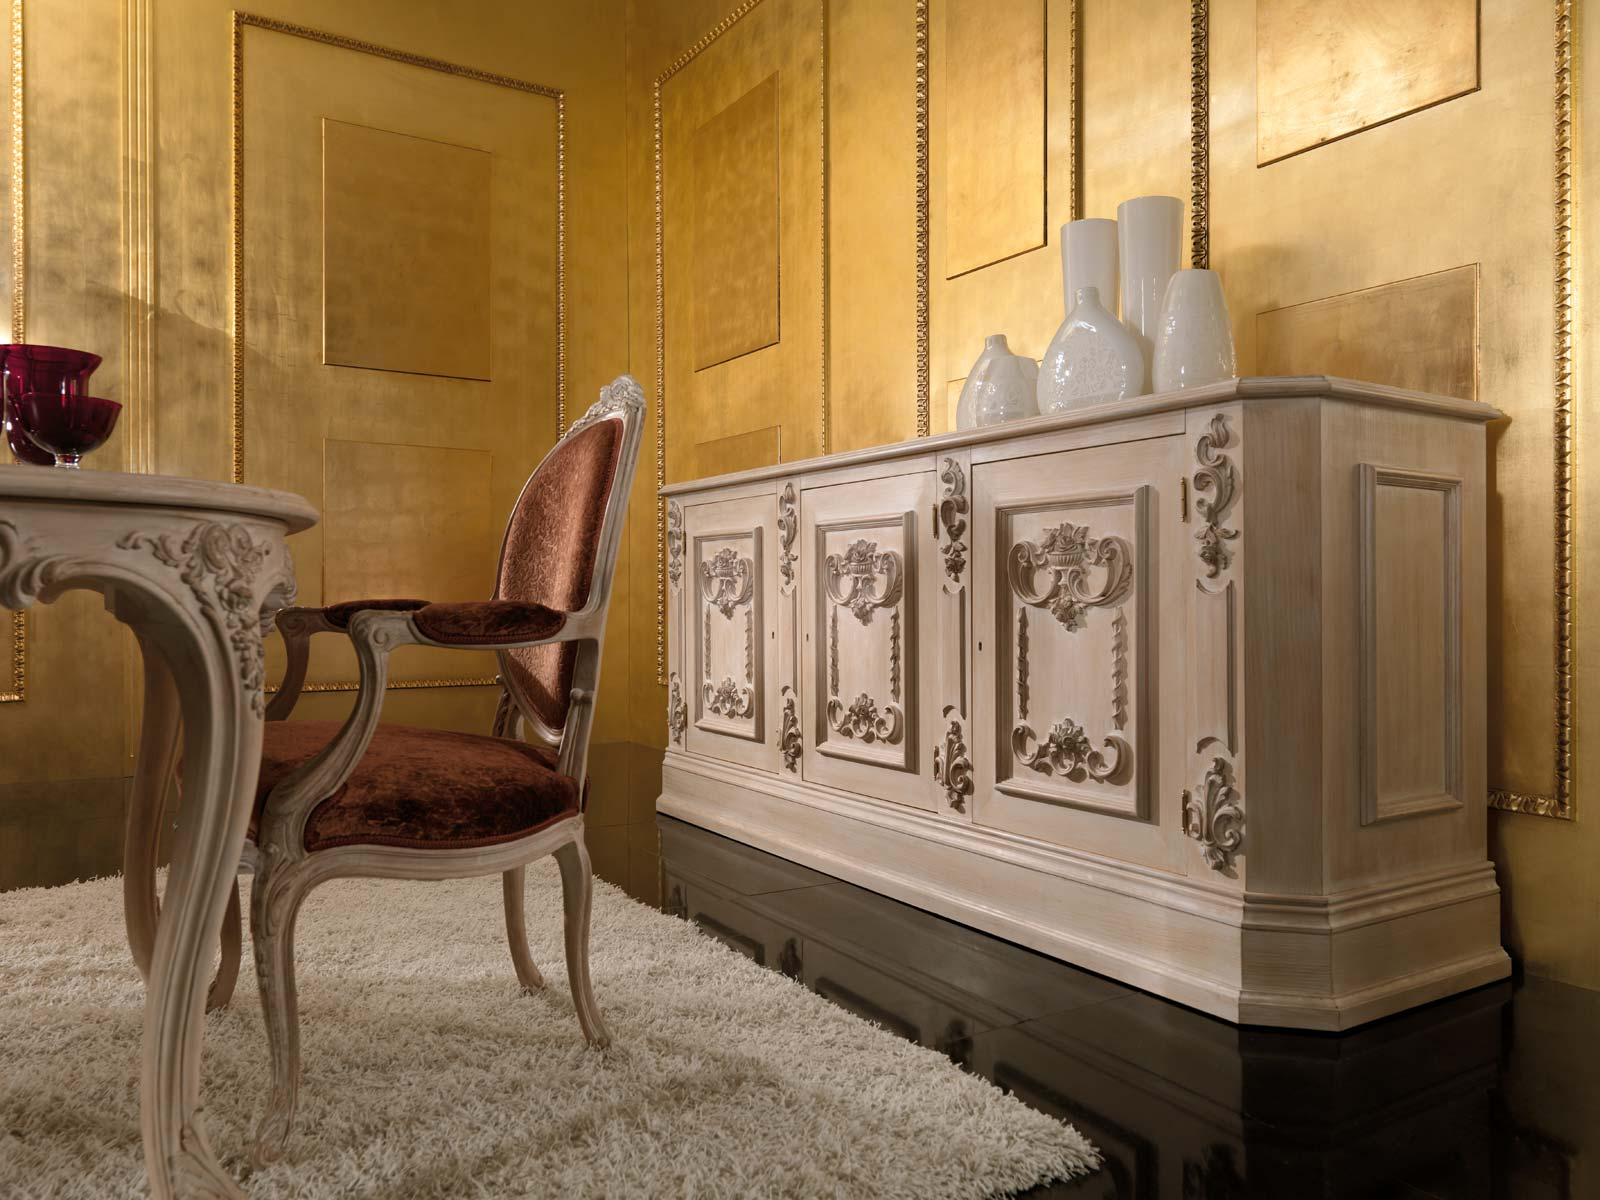 ... Di Lusso : Di lusso immagine art carmen mobili ingresso classici